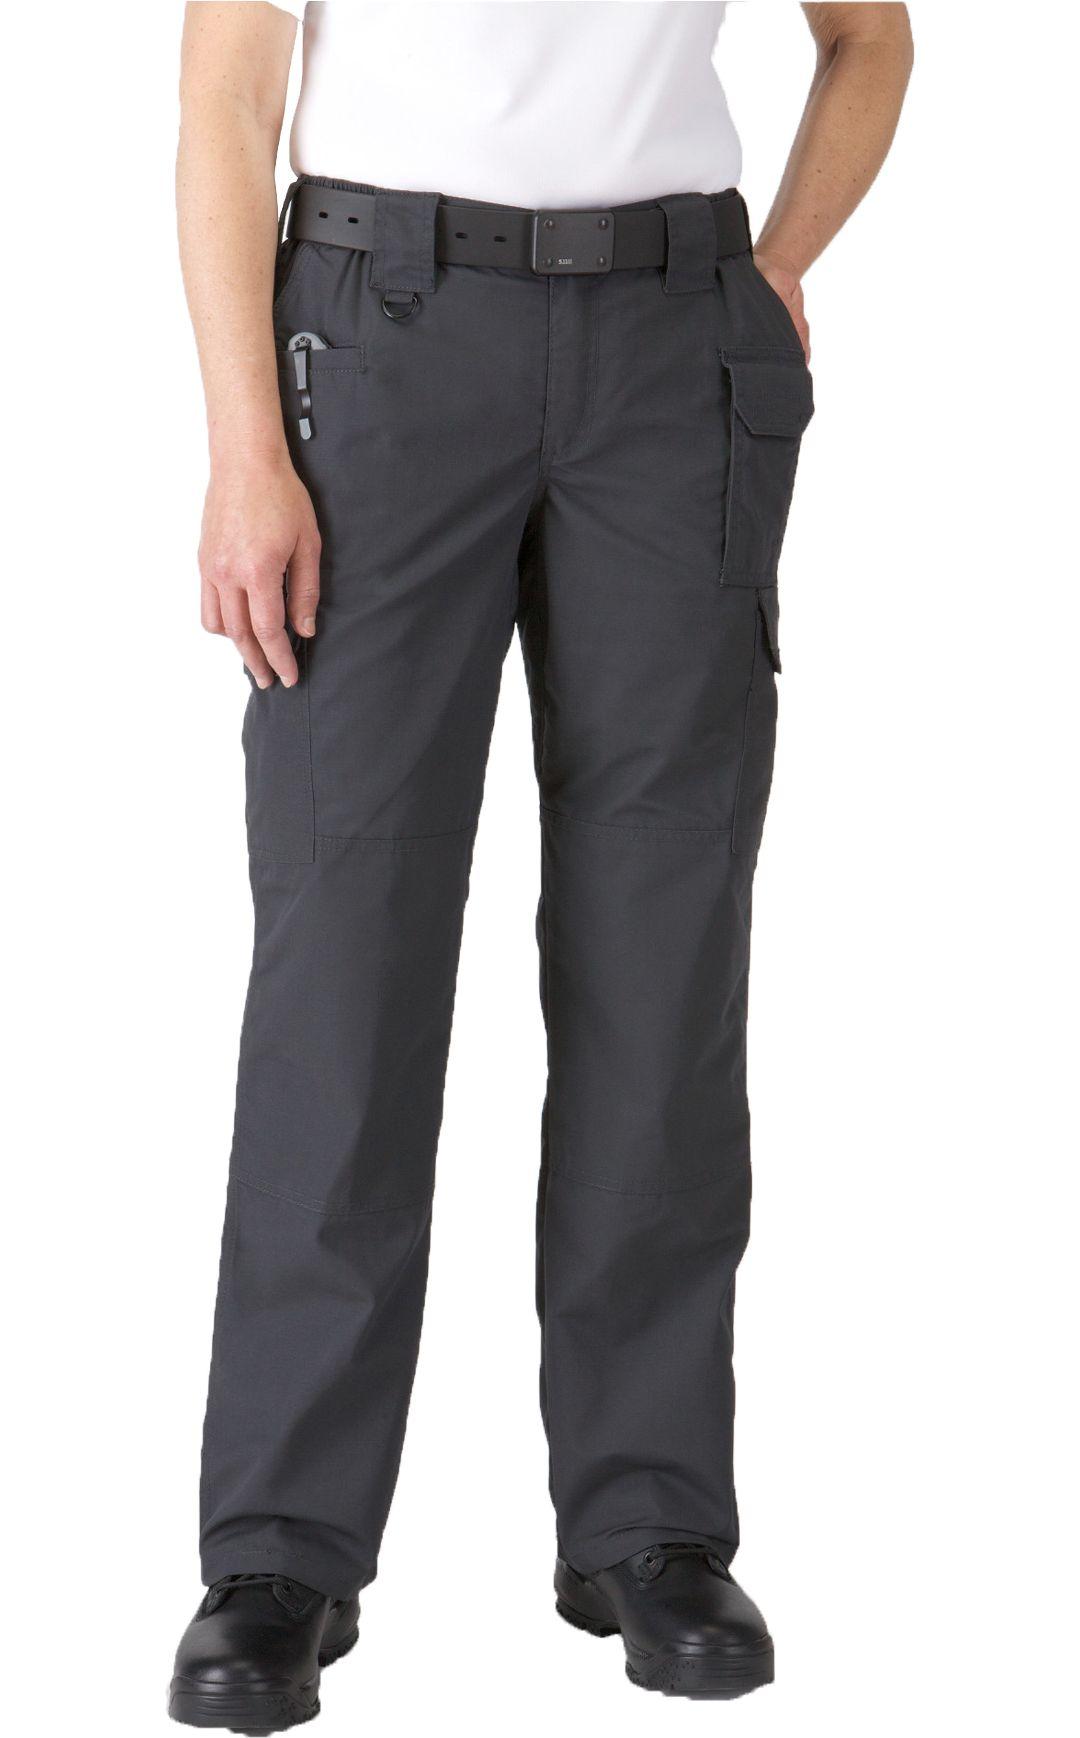 164bd52310d 5.11 Tactical Women s Taclite Pro Pants 1